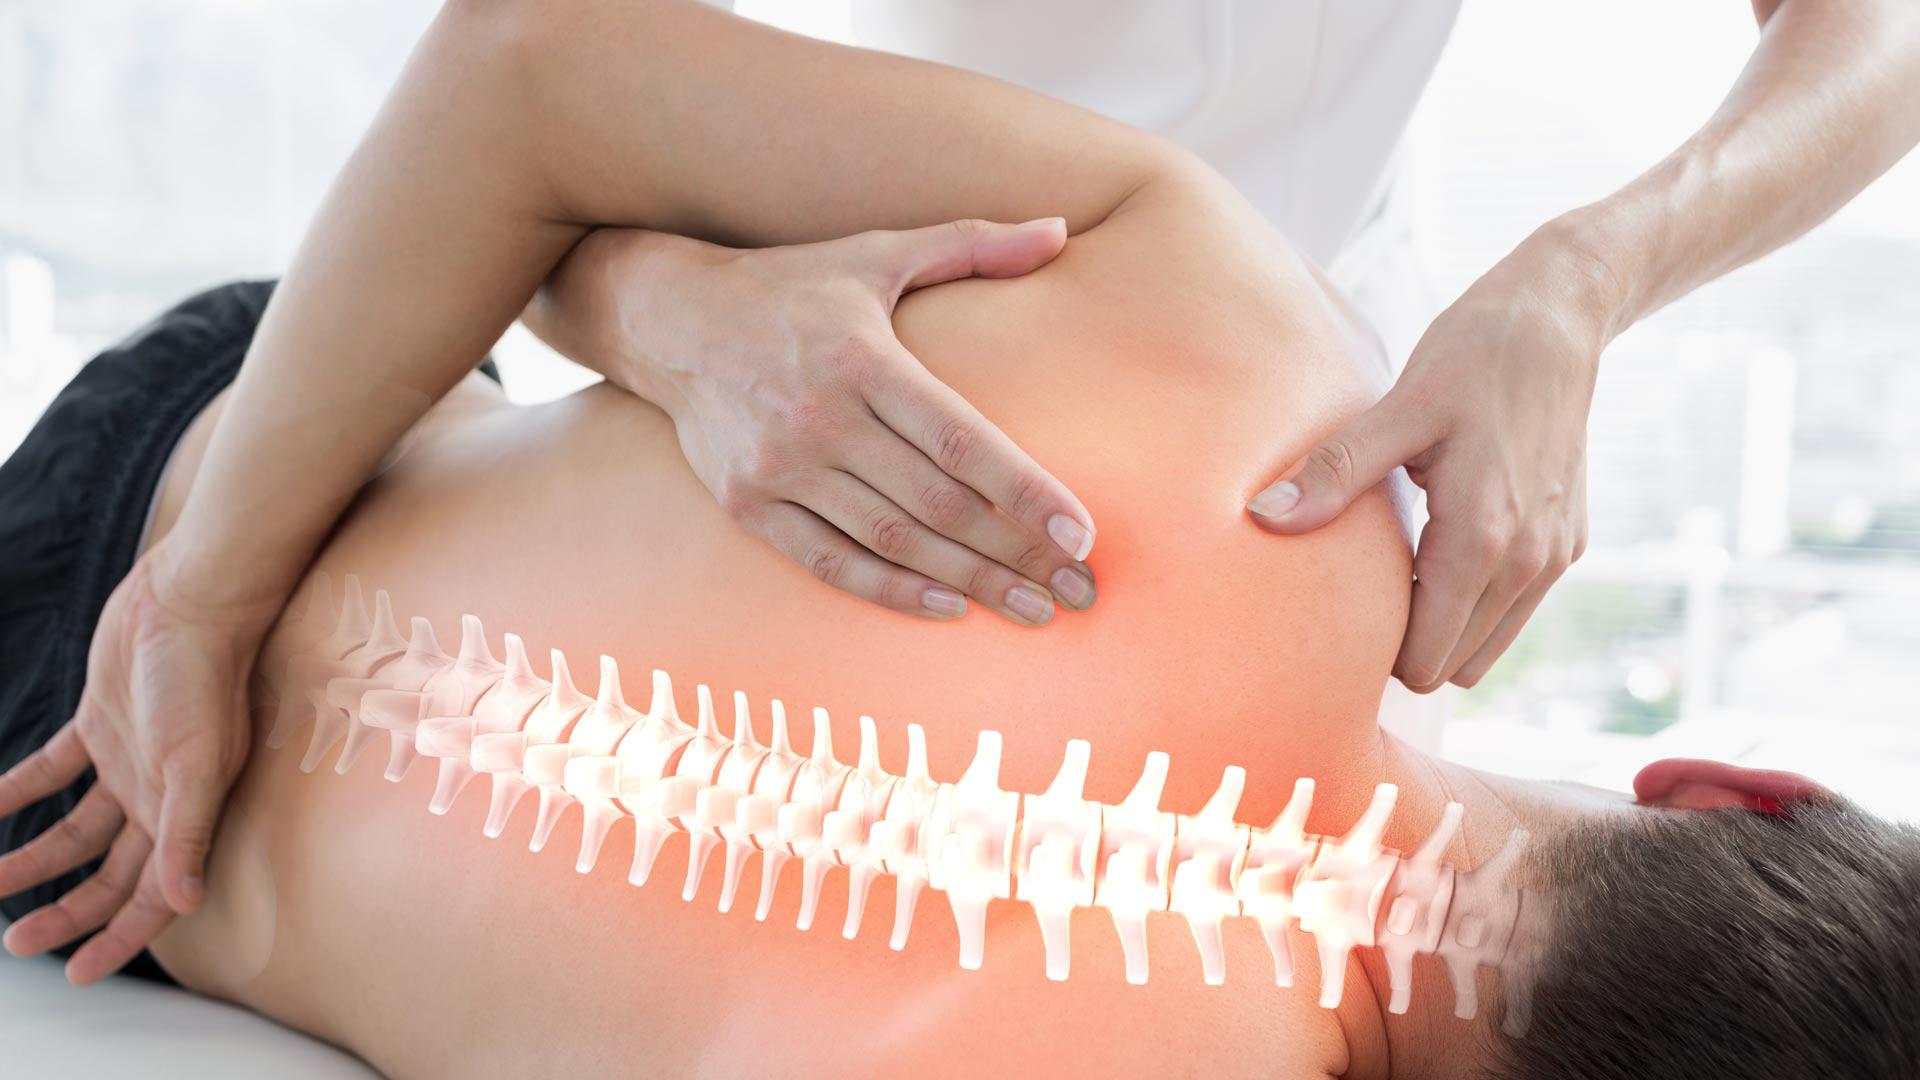 fysiotherapeut-kiezen